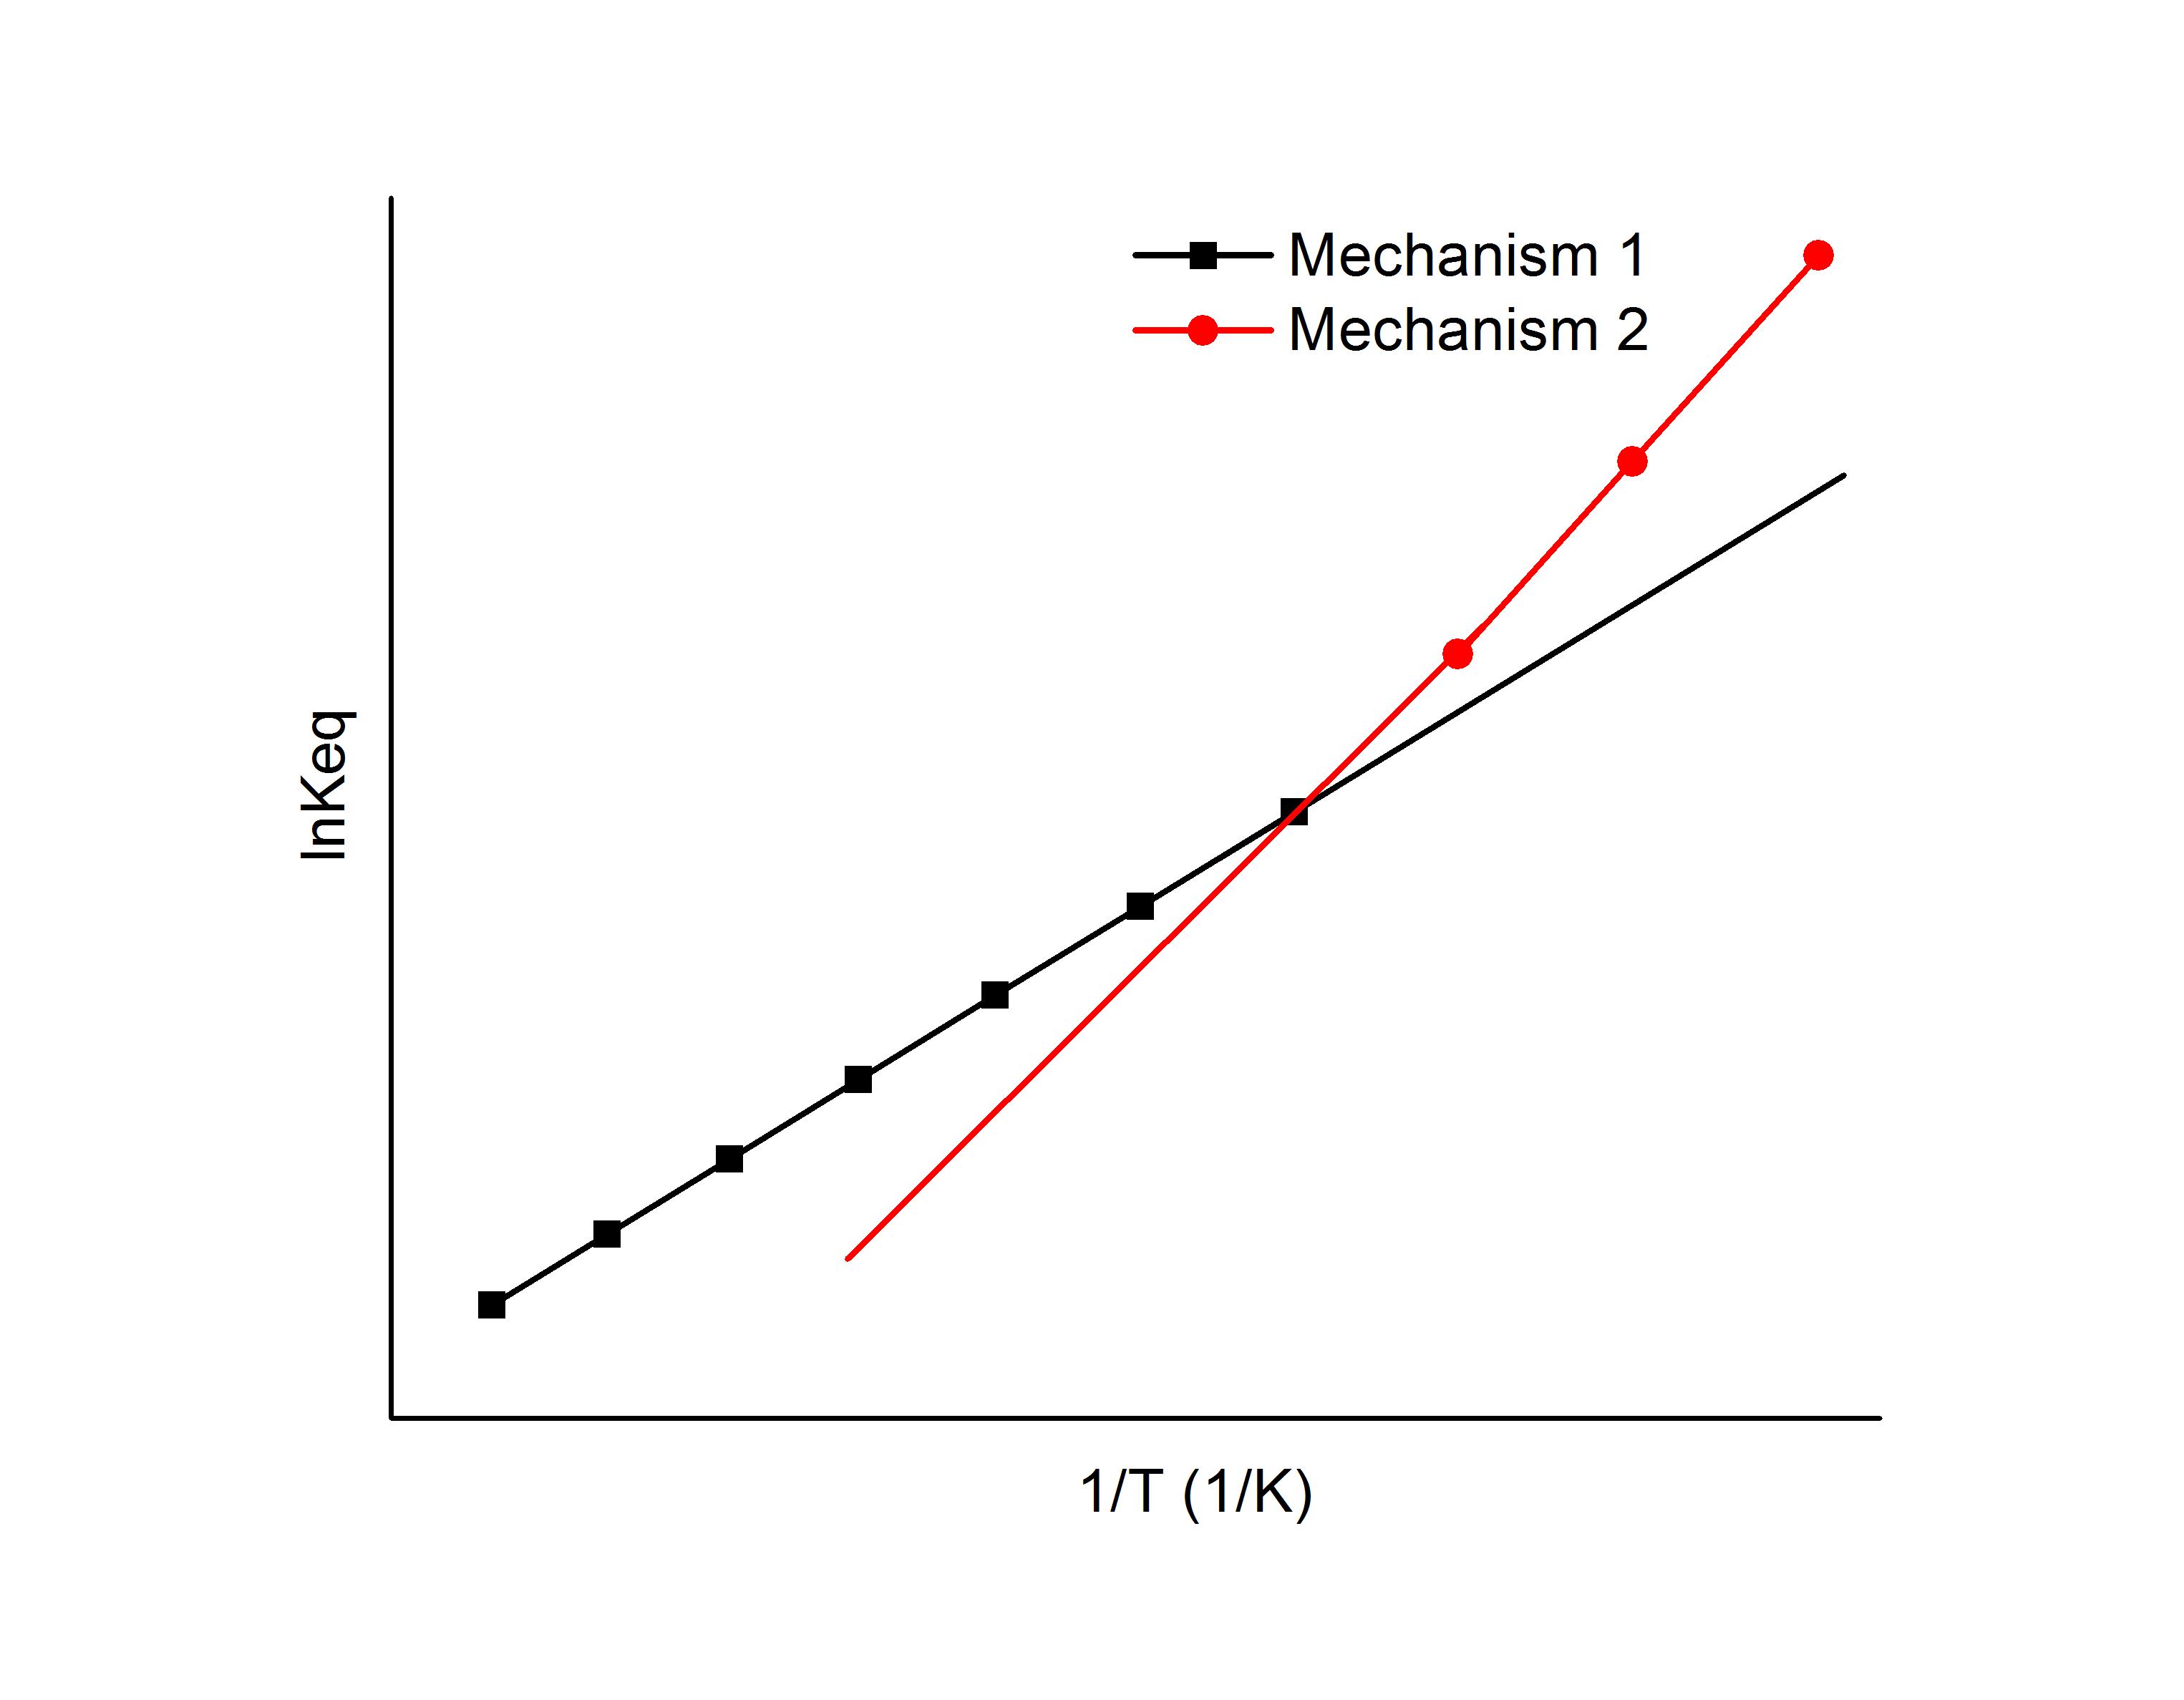 Mechanistic Studies[edit]